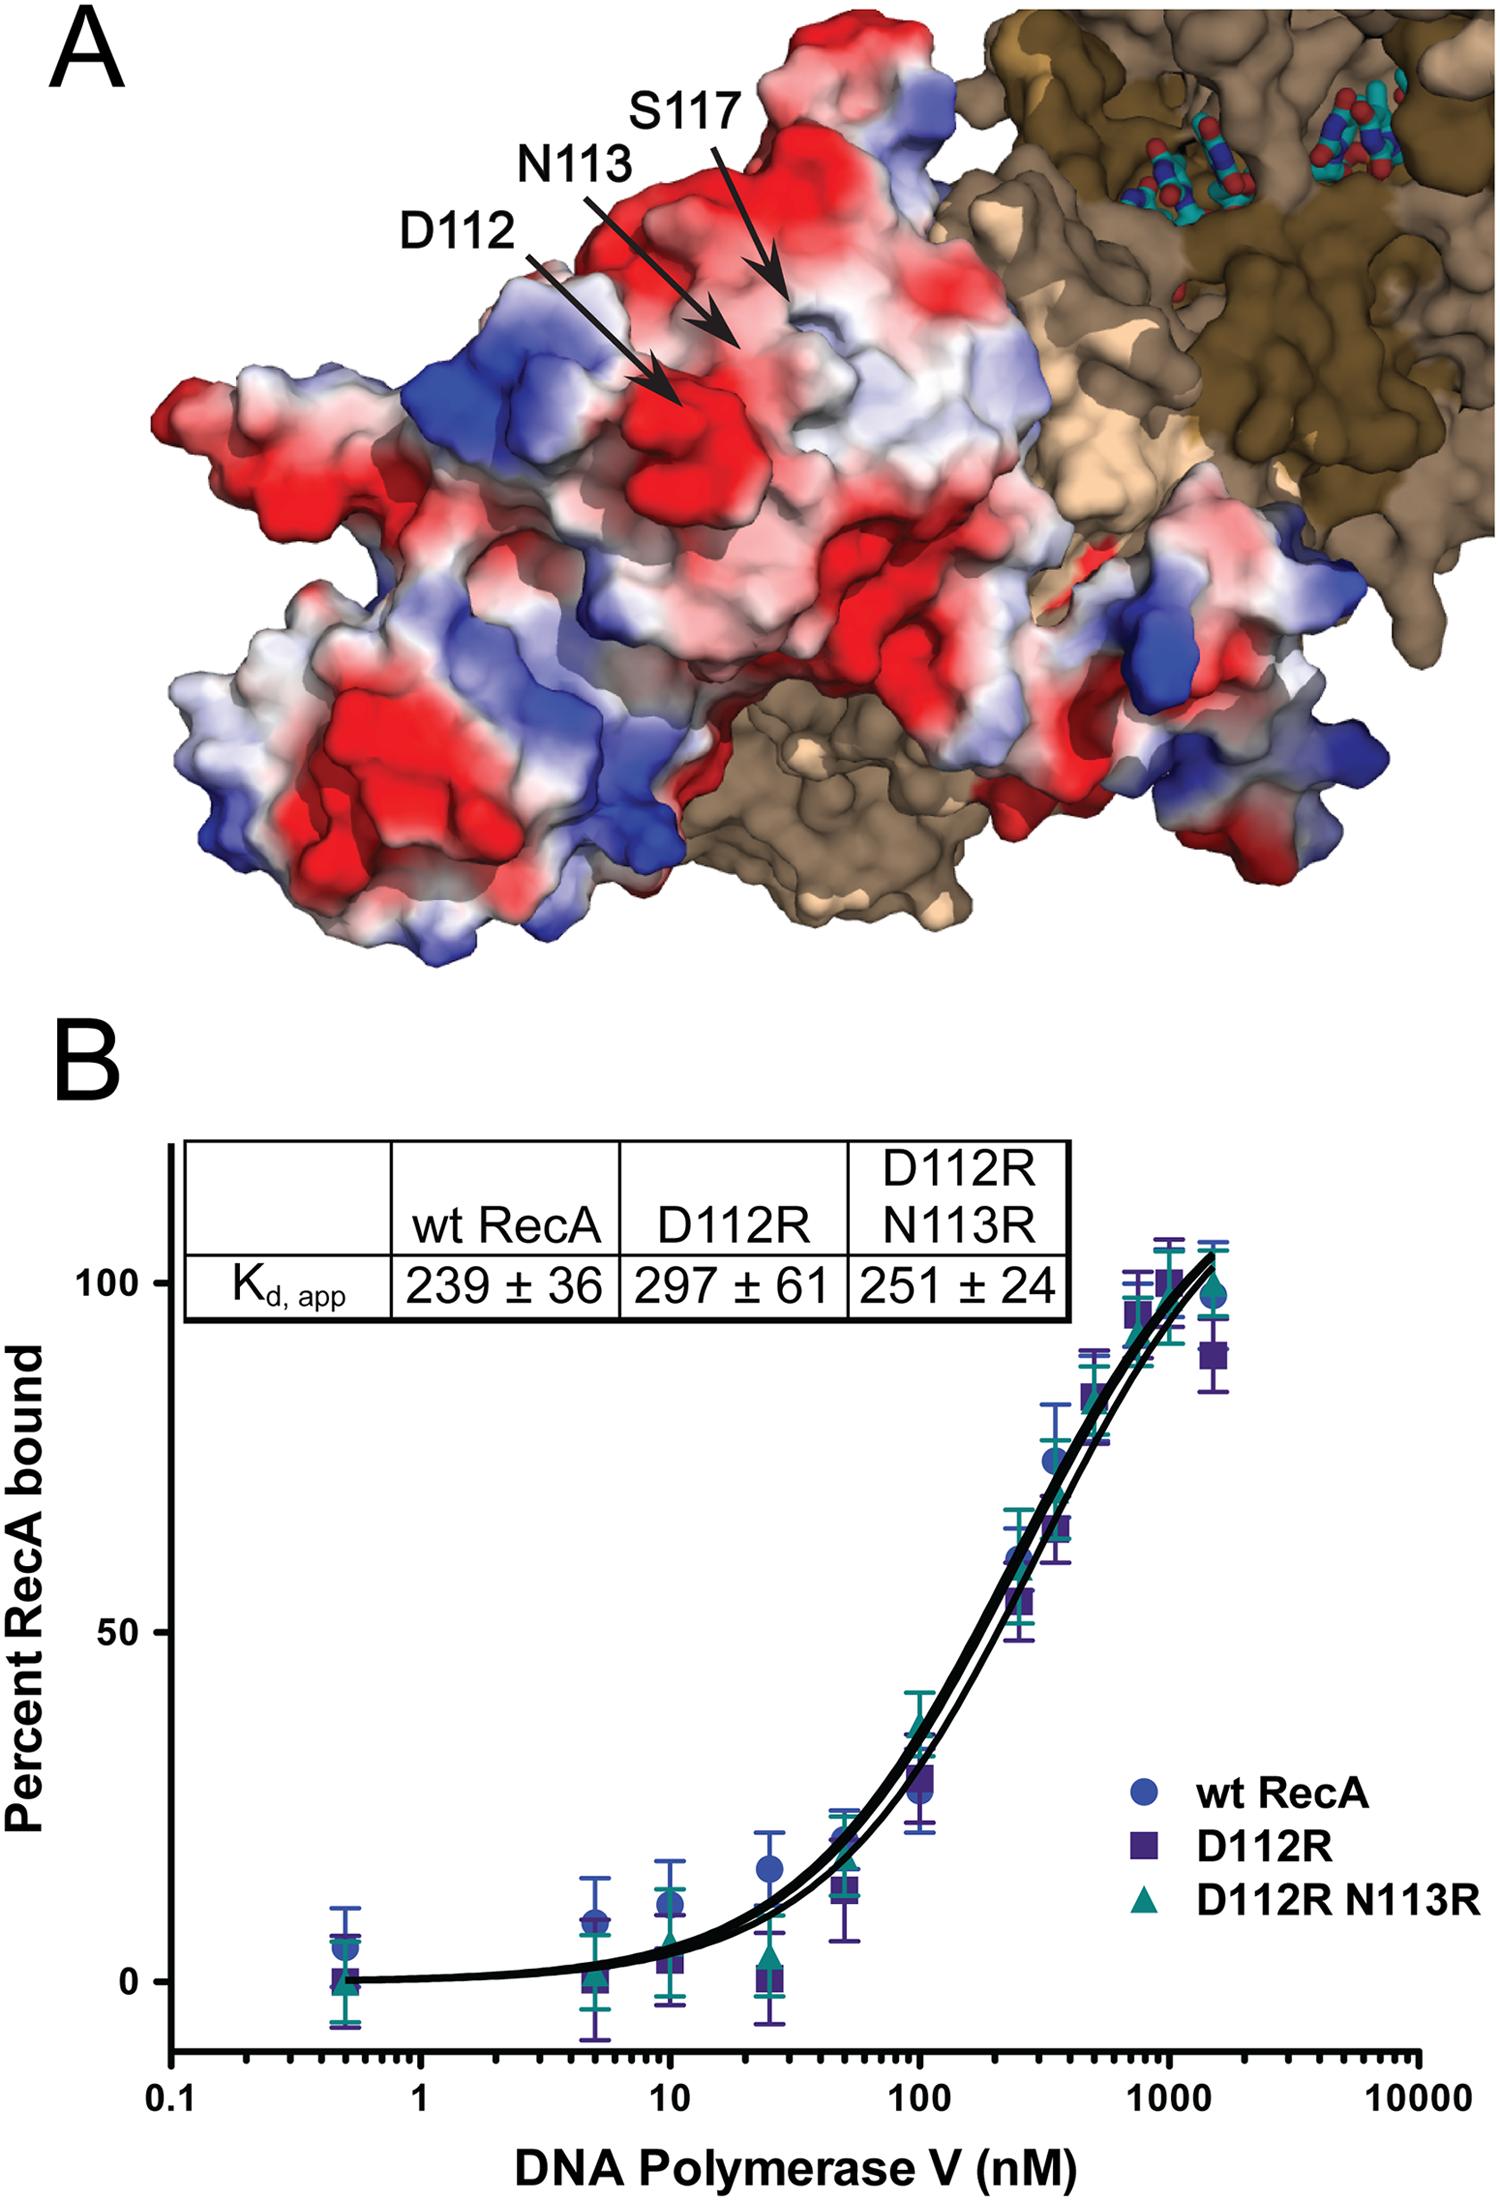 RecA D112R and D112R N113R exhibit wild-type RecA binding affinities for pol V.